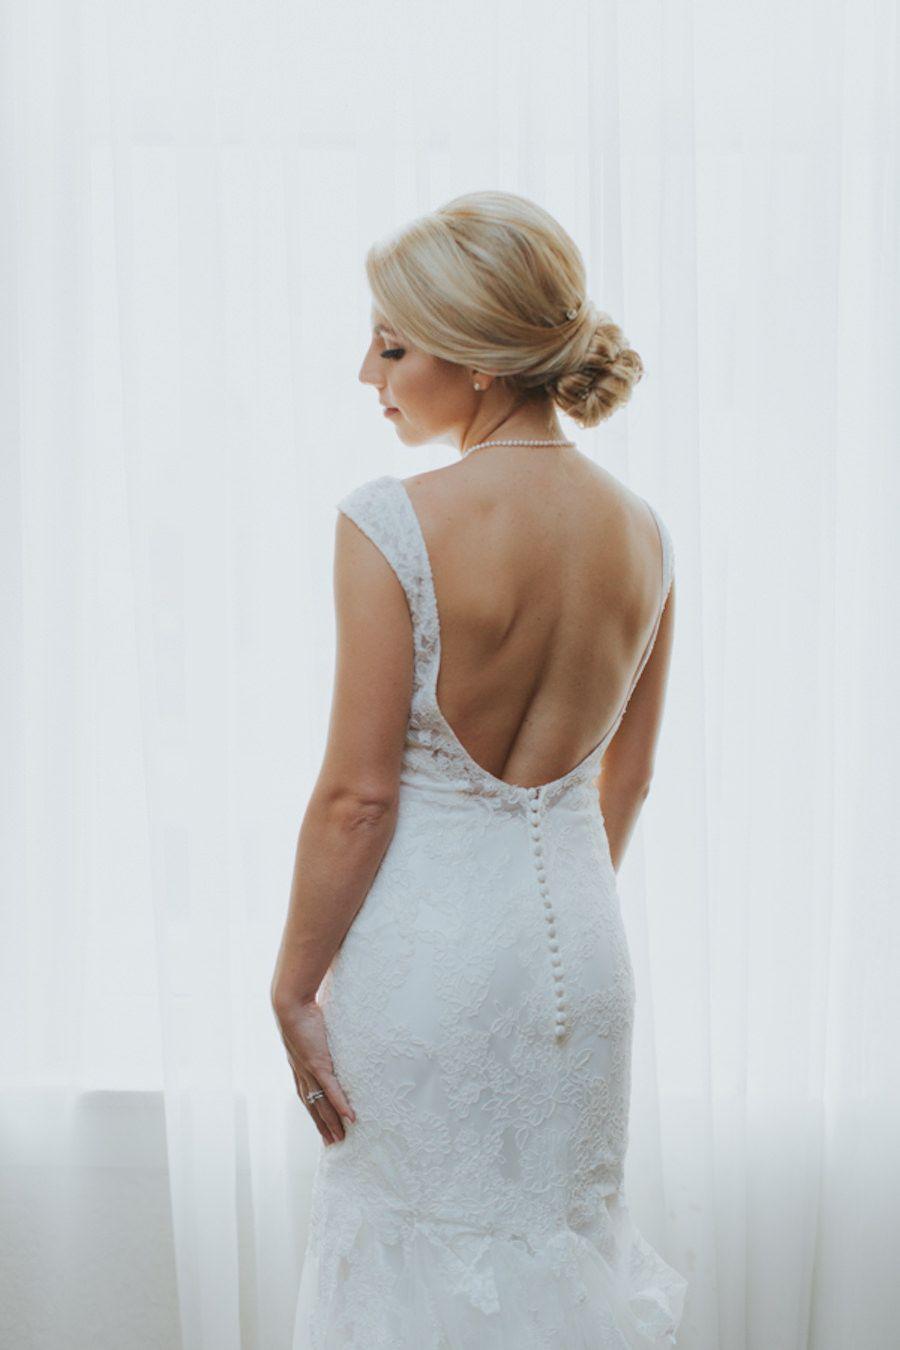 Lace wedding dress low back  Bride Wedding Portrait in Low Back Lace Ivory Allure Wedding